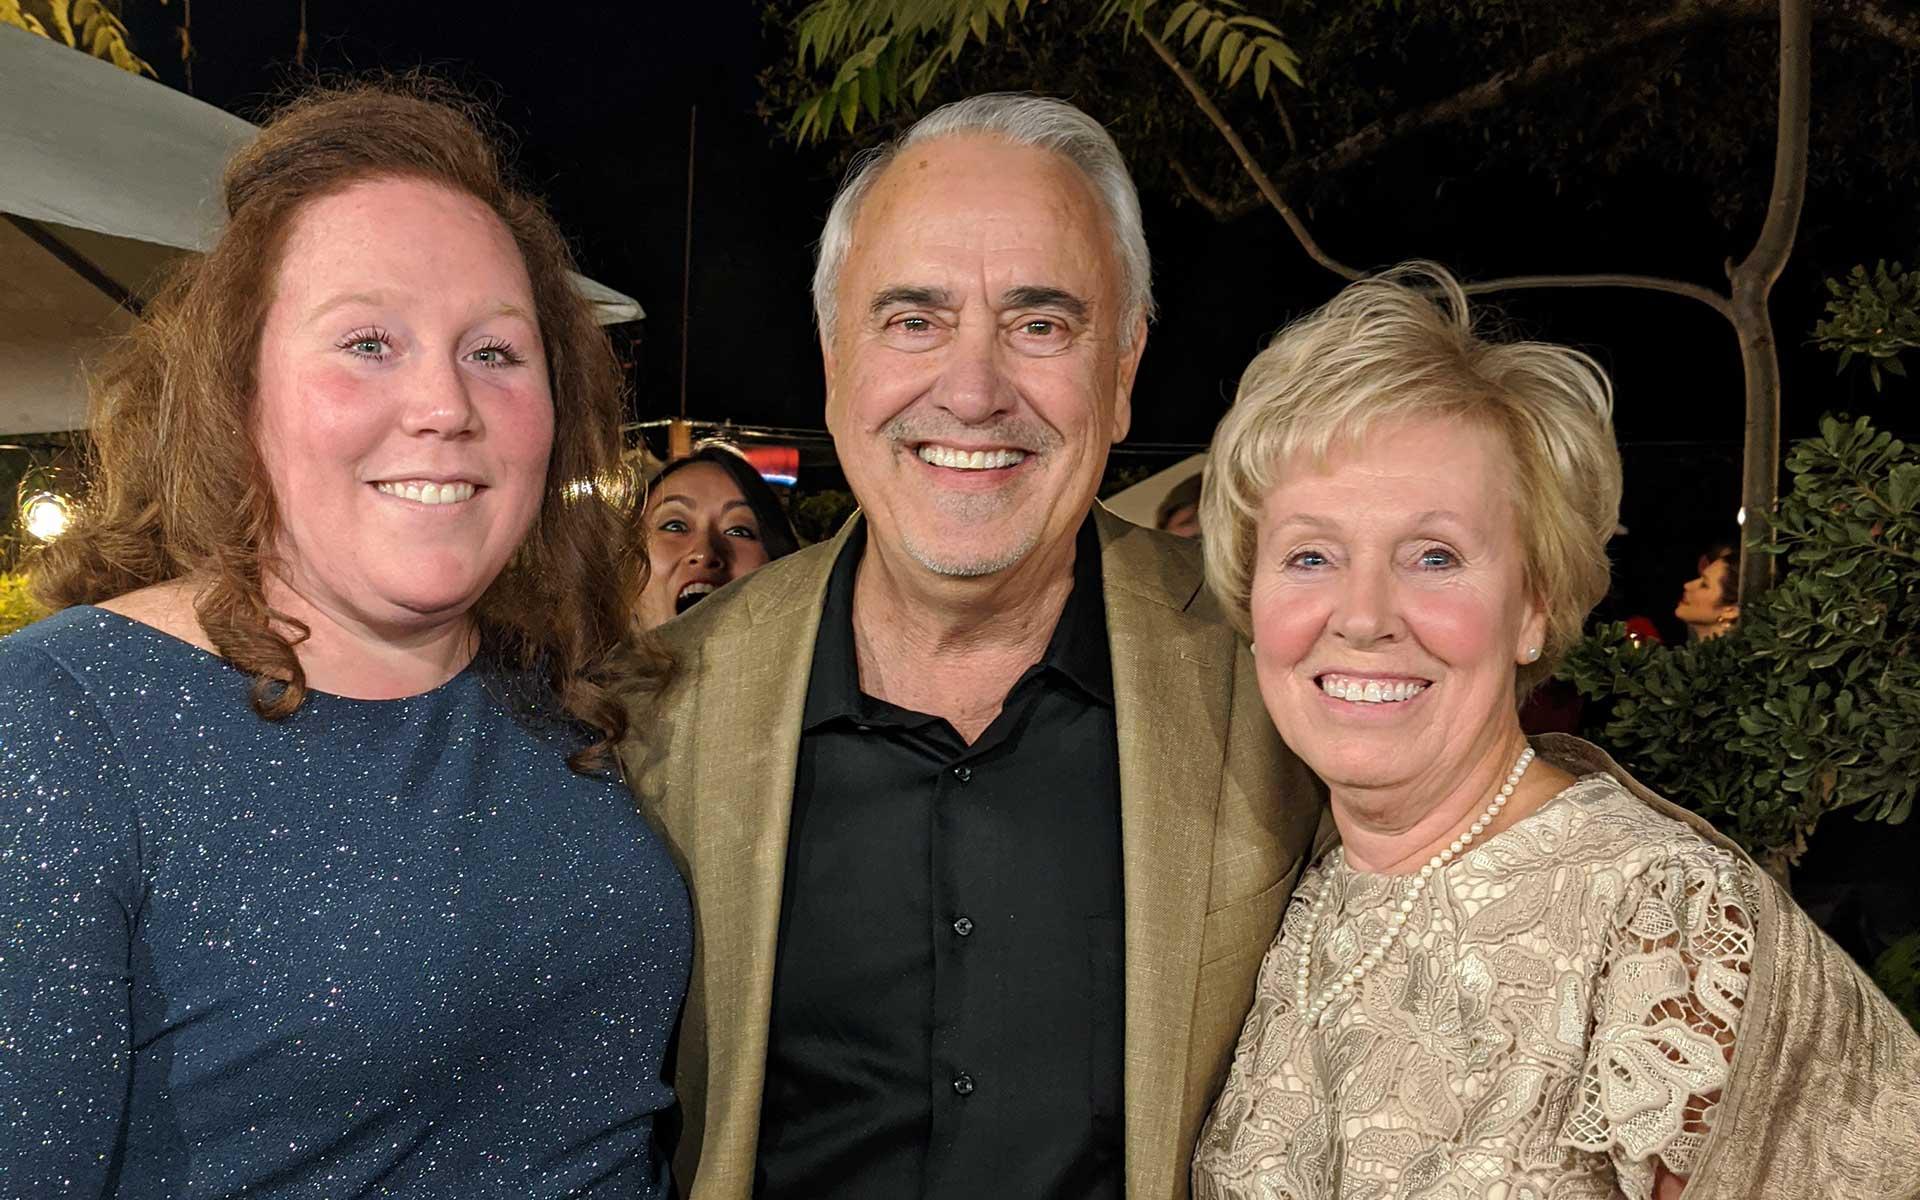 Ashley, Jim and Dorinda